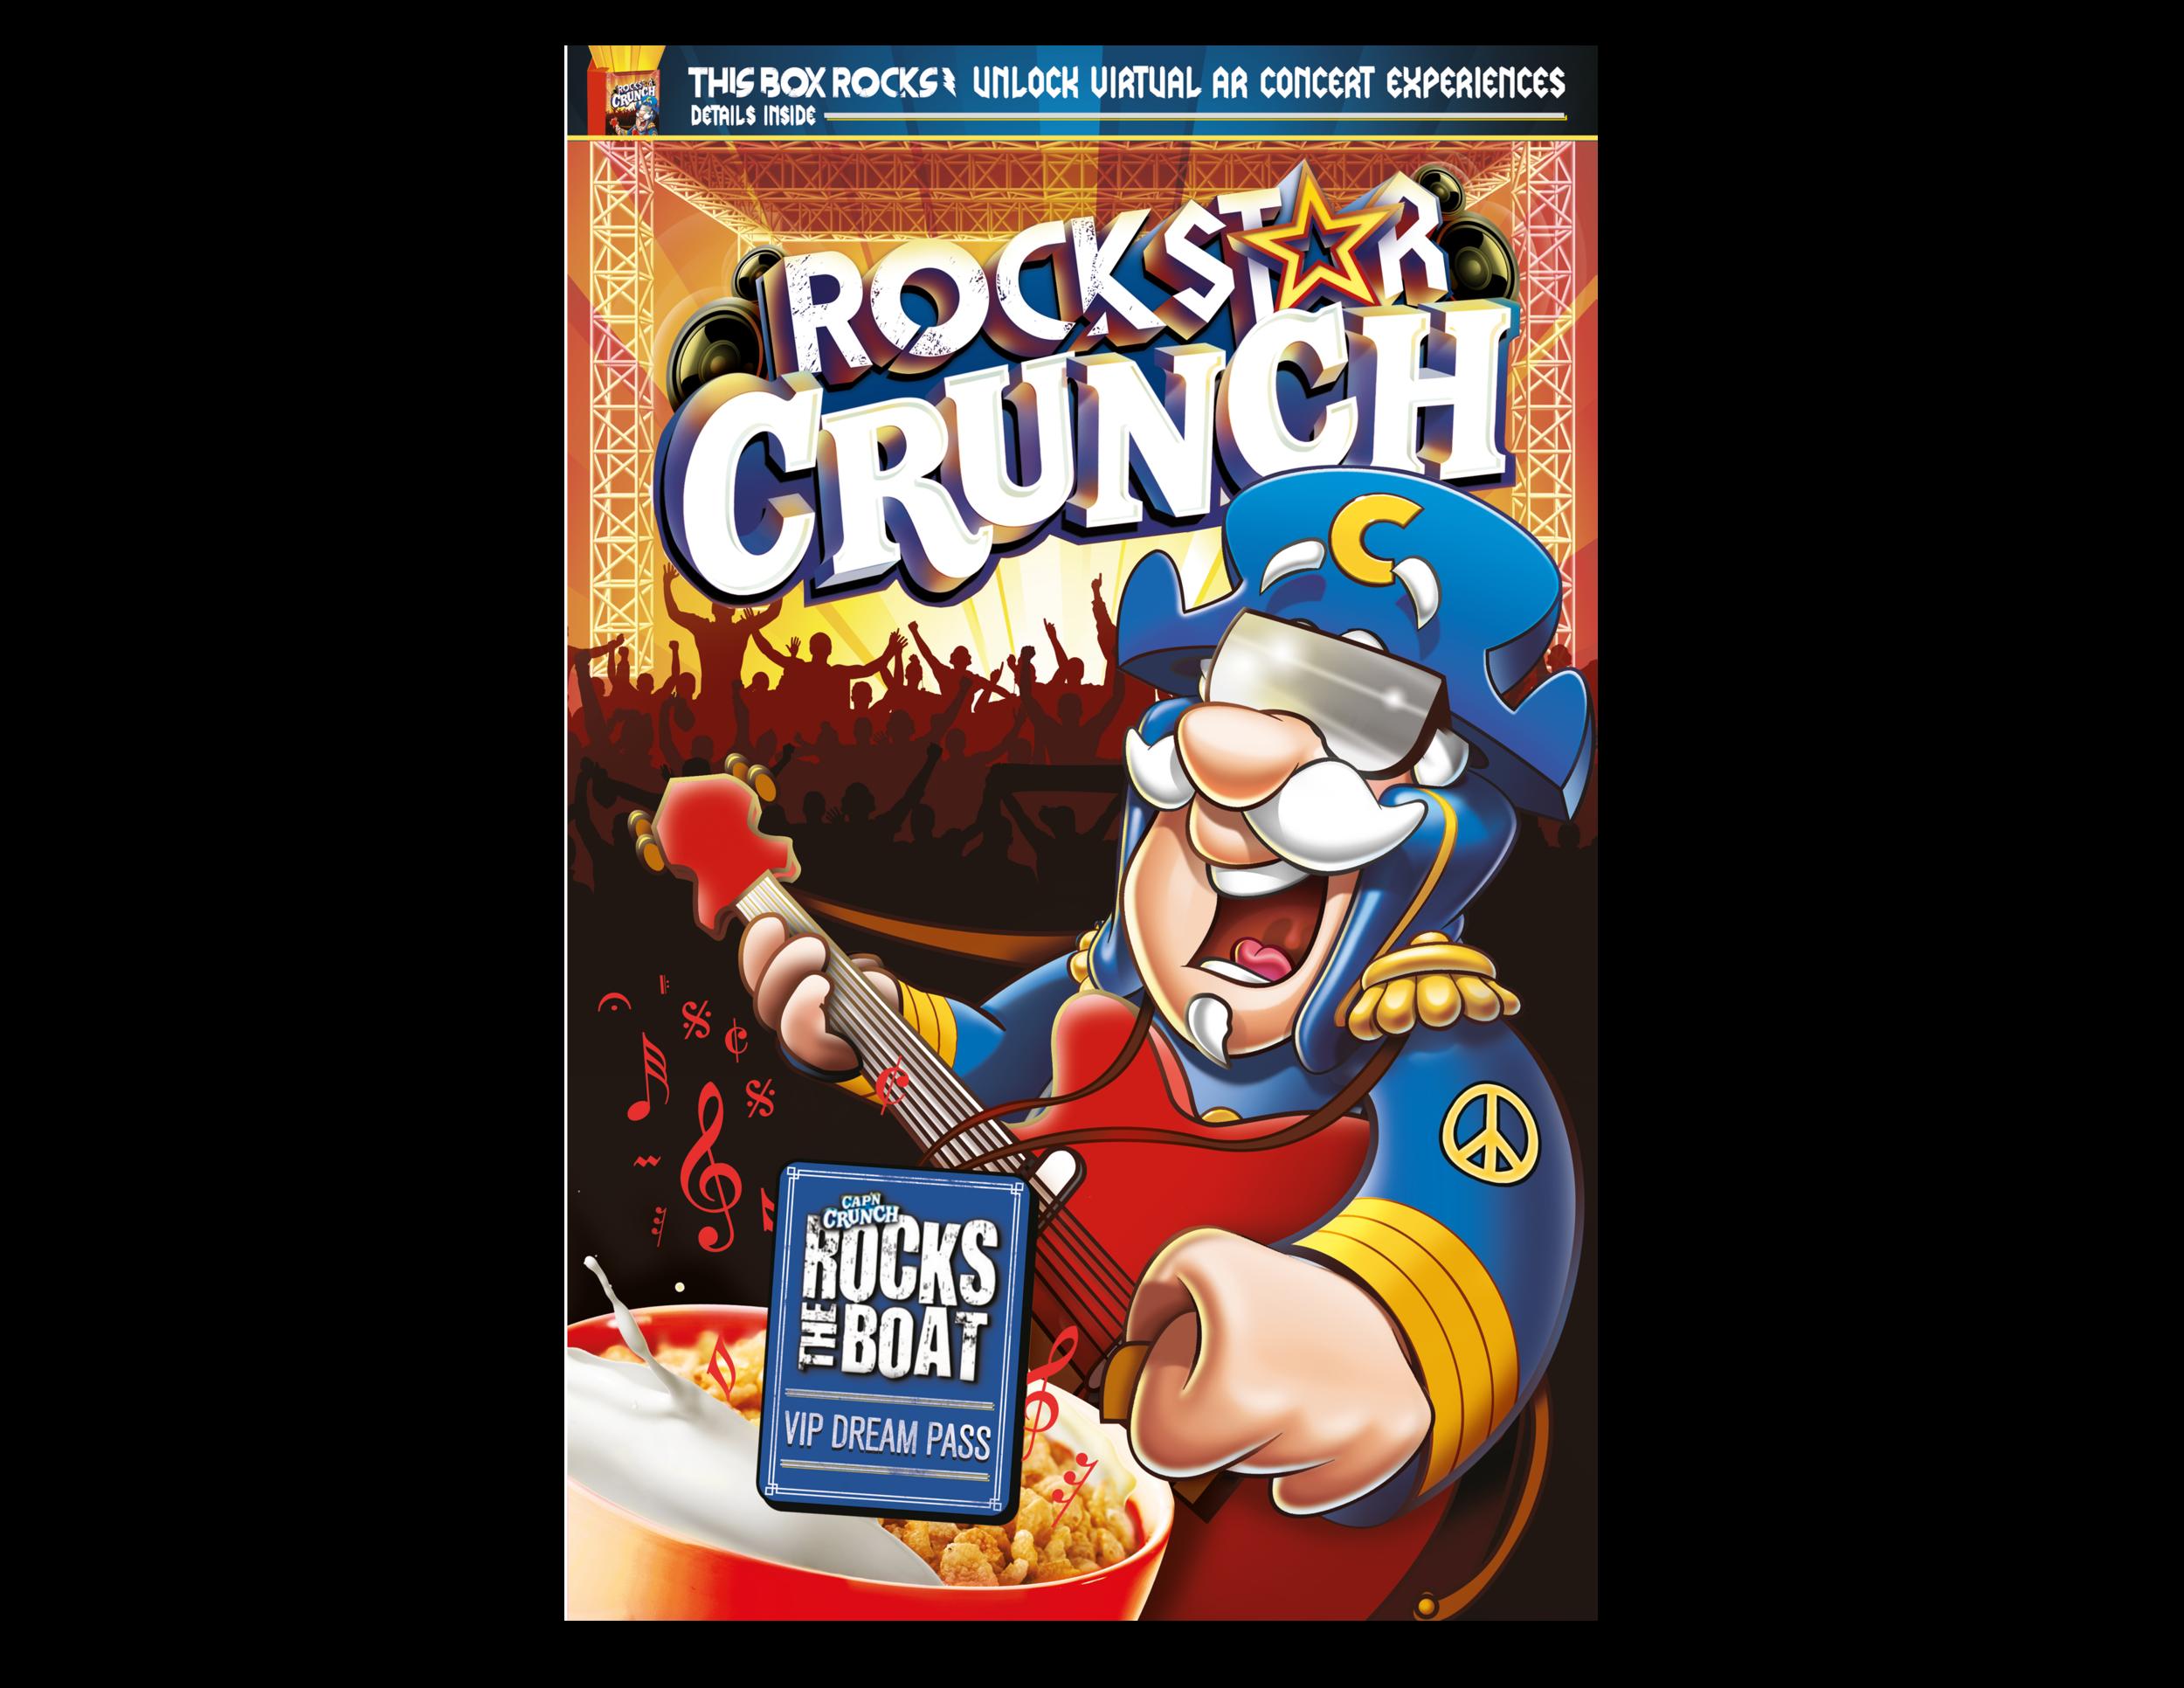 CAP'N CRUNCH ROCKSTAR CRUNCH ROCKS THE BOAT PROMOTION (CONCEPT / CUSTOM ILLUSTRATION)